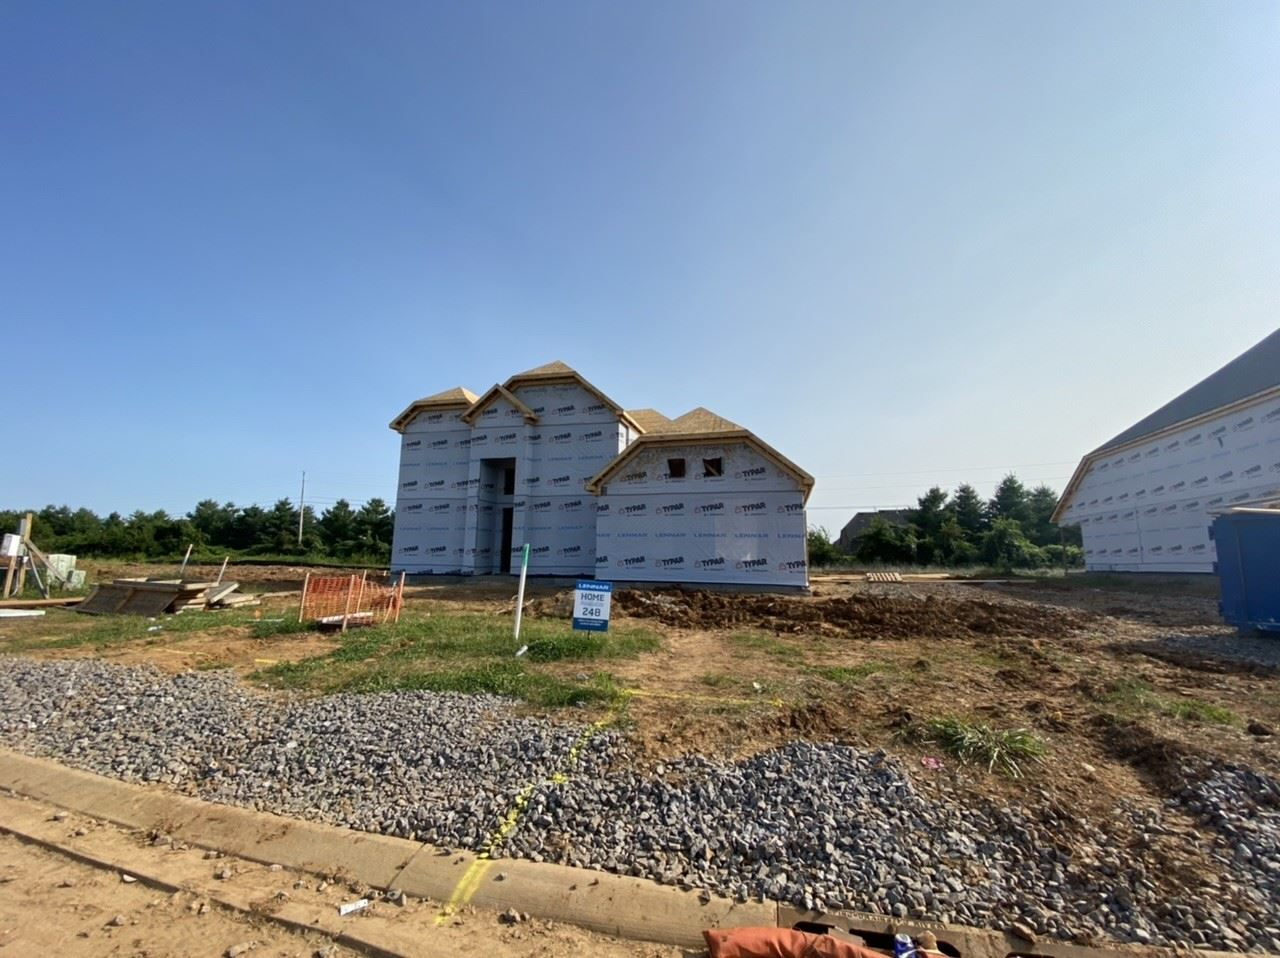 4731 Tritschler Lane Lot 248A, Murfreesboro, TN 37128 - MLS#: 2181264